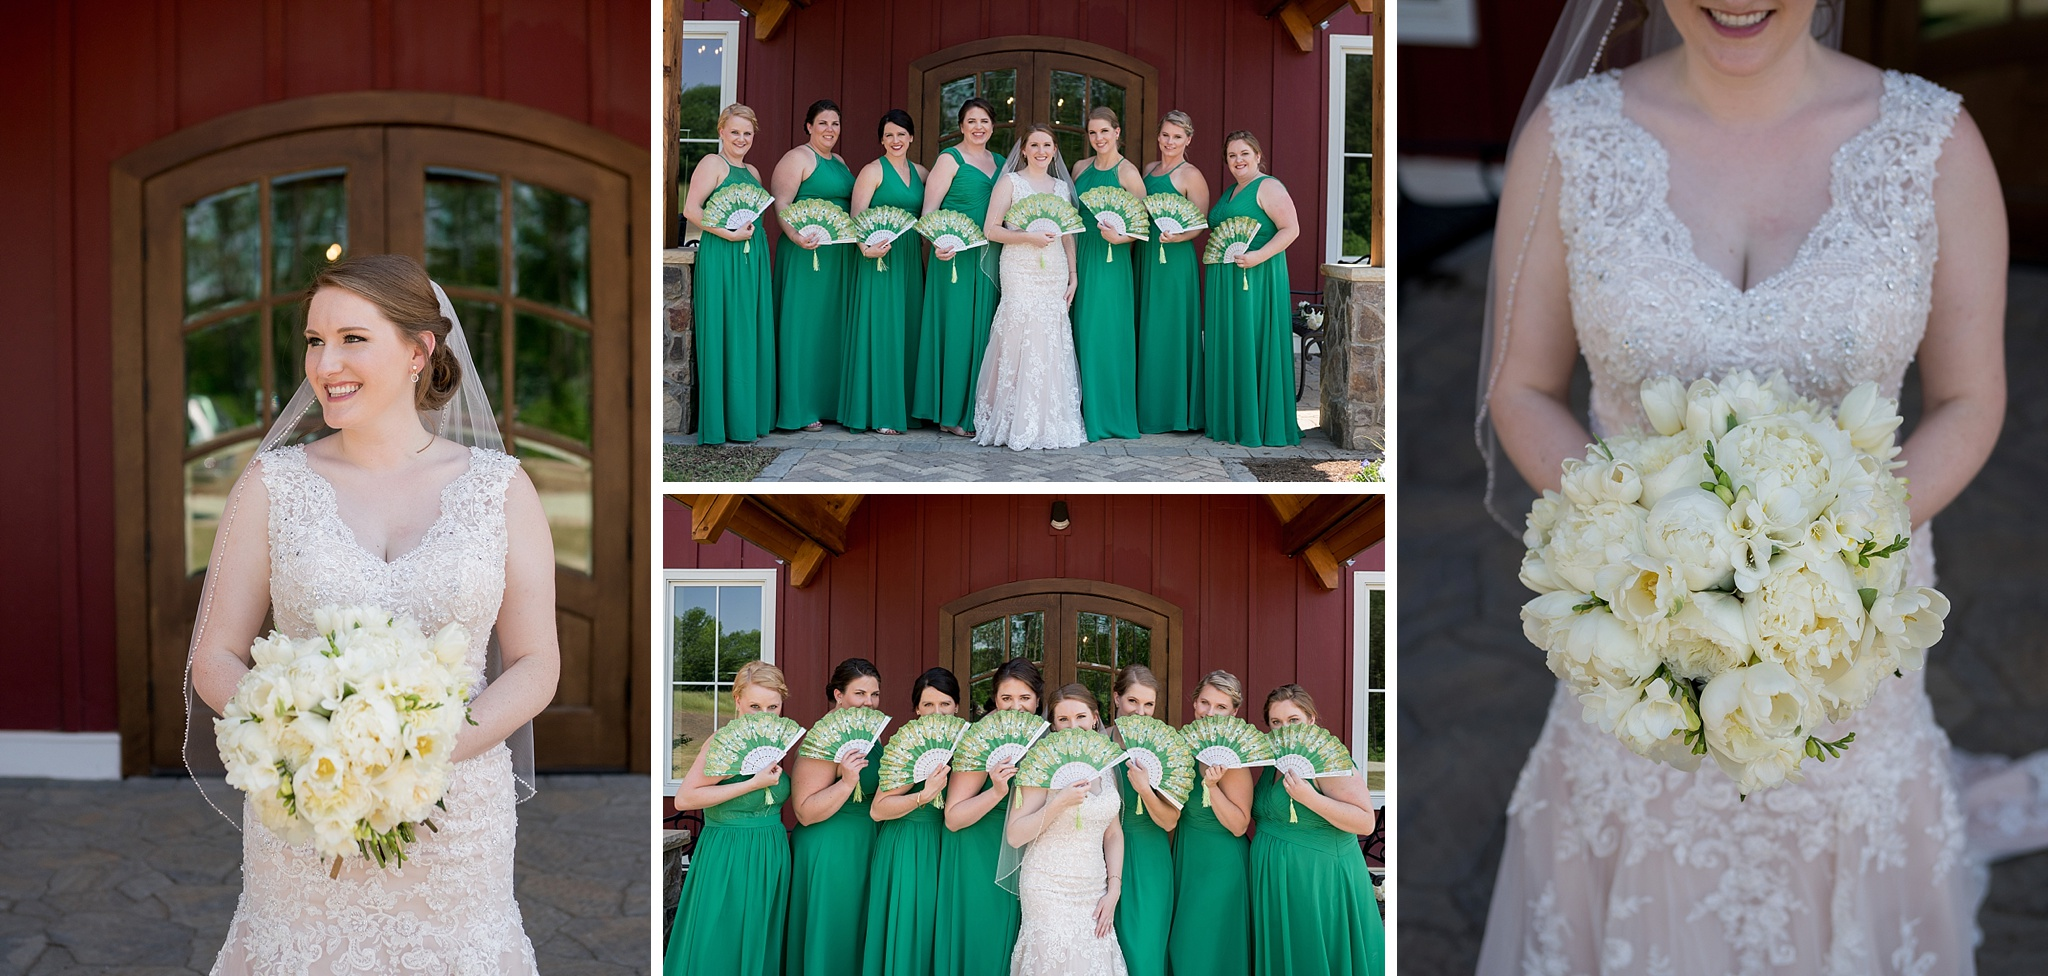 Pavilion-Carriage-Farms-Wedding-Photographer-204.jpg